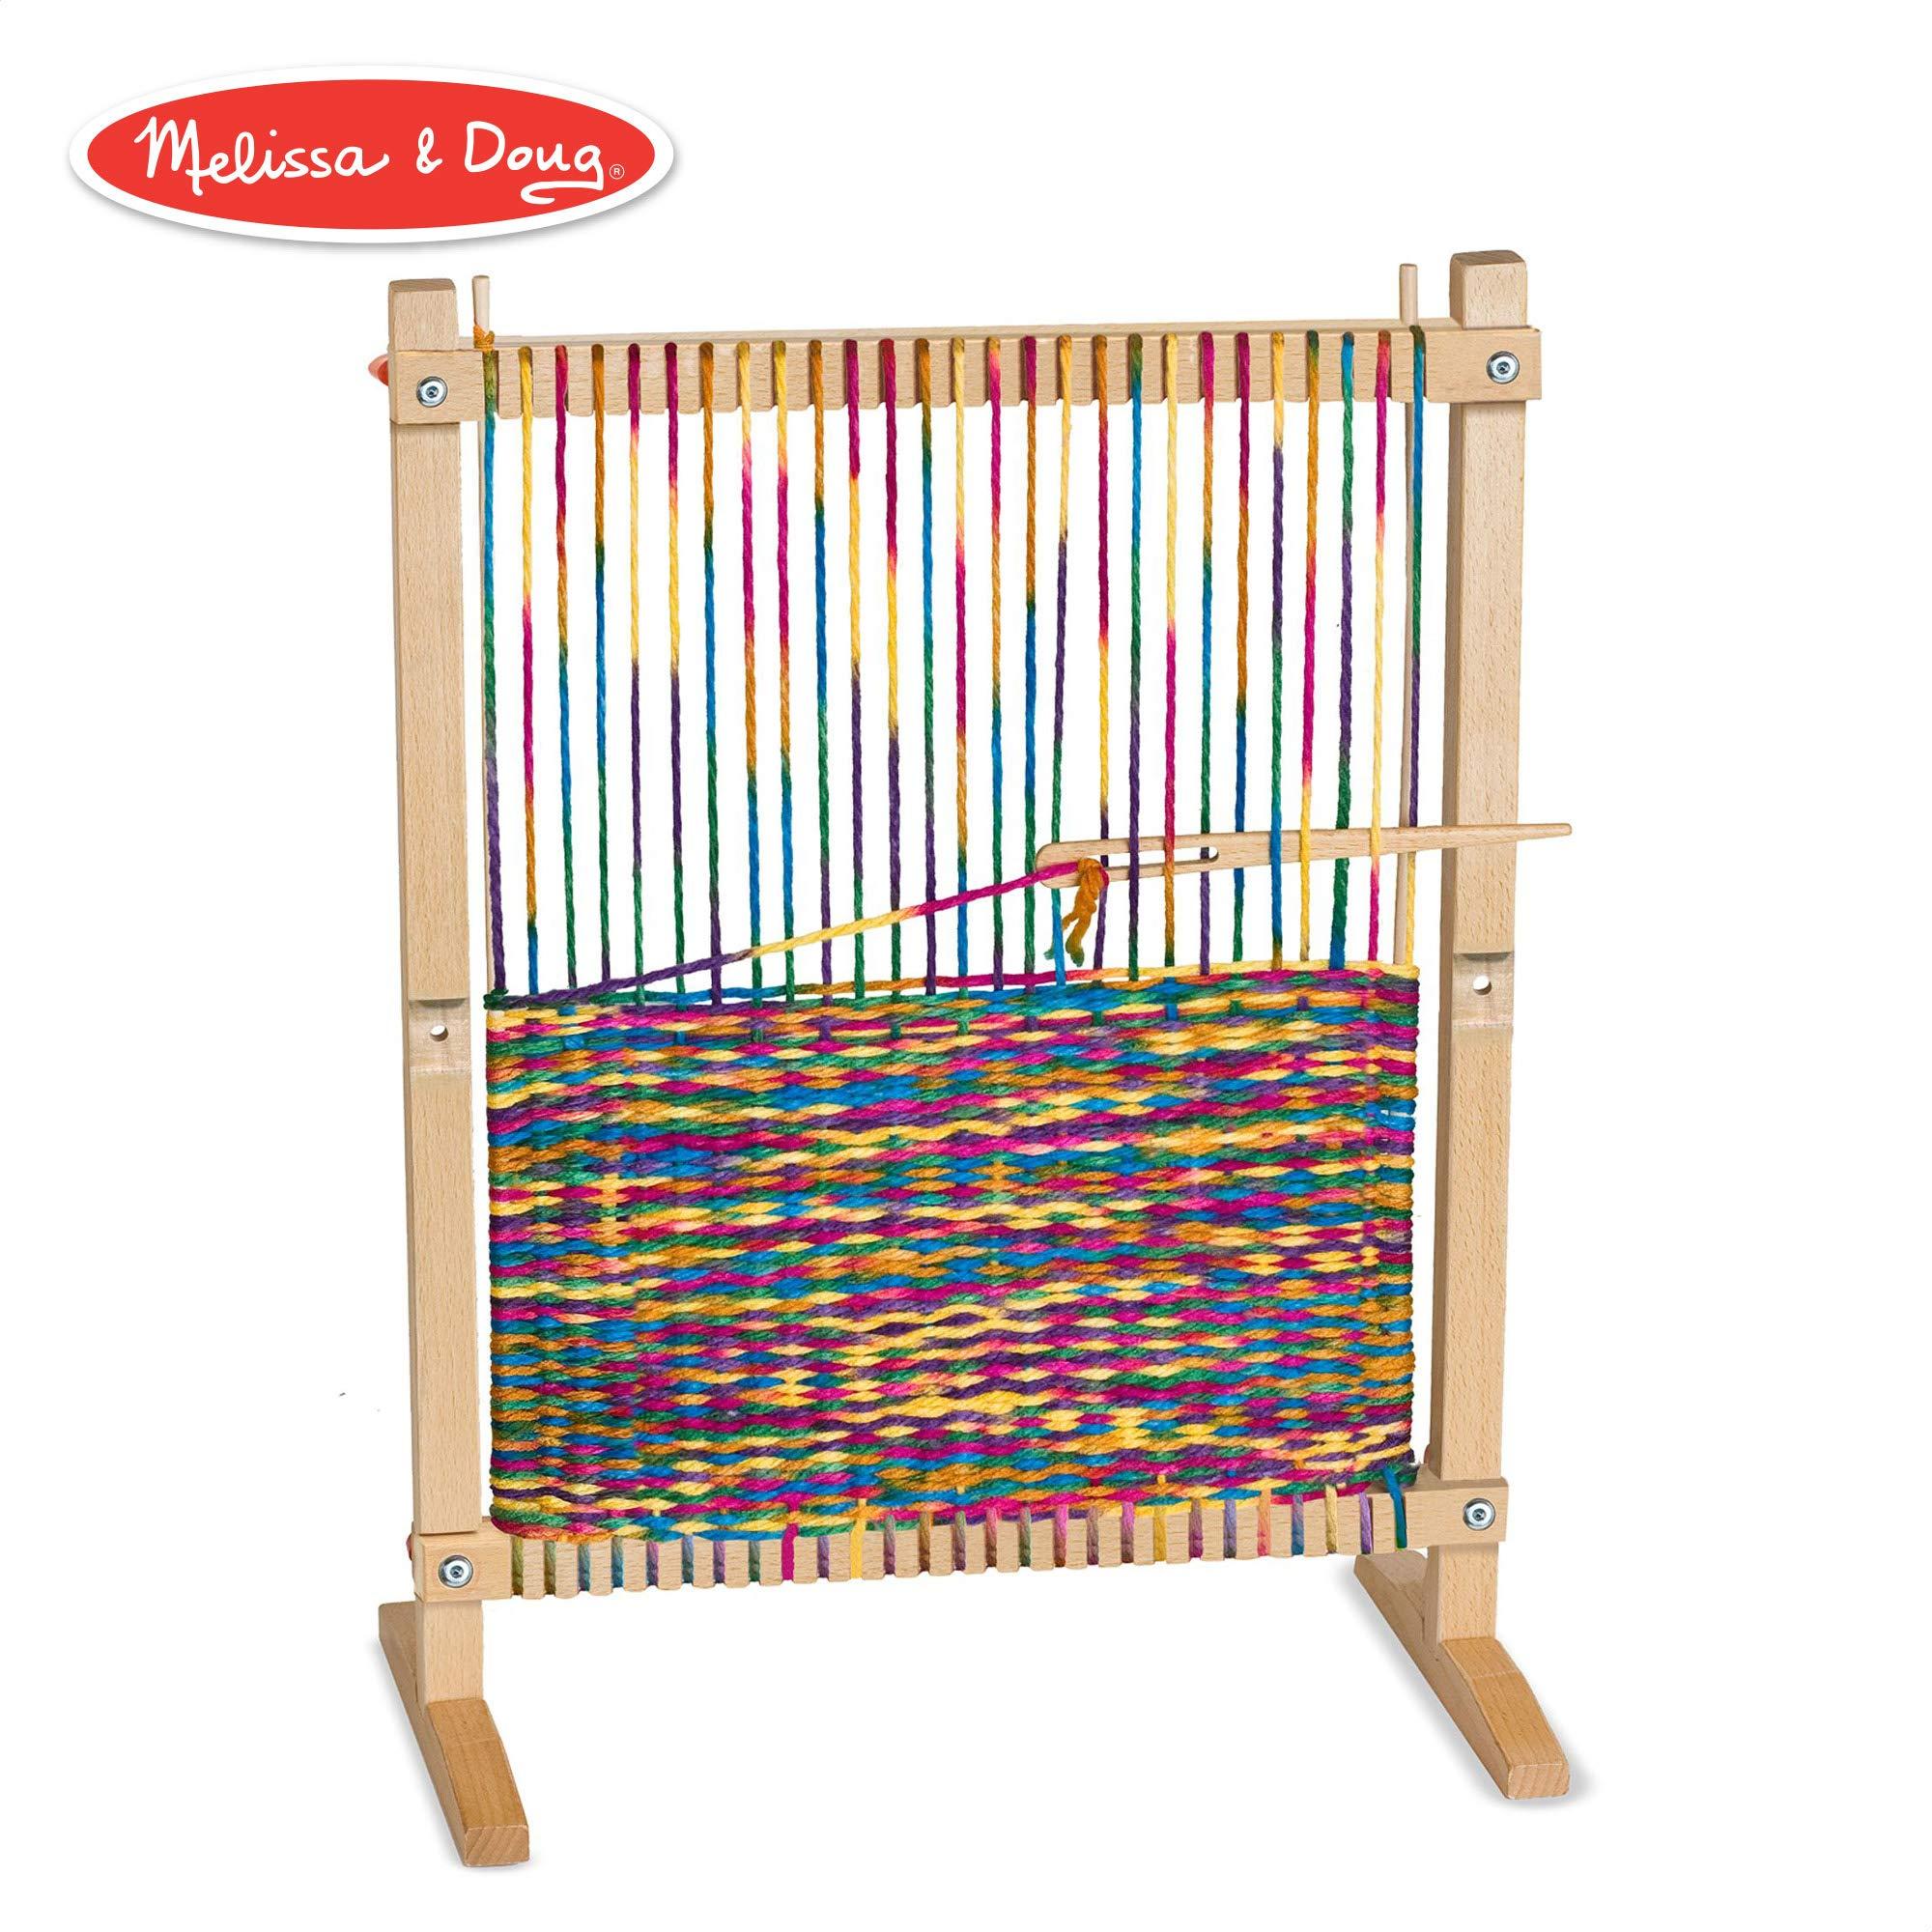 Melissa & Doug Wooden Multi-Craft Weaving Loom (Arts & Crafts, Extra-Large Frame, Develops Creativity and Motor Skills, 16.5'' H x 22.75'' W x 9.5'' L) by Melissa & Doug